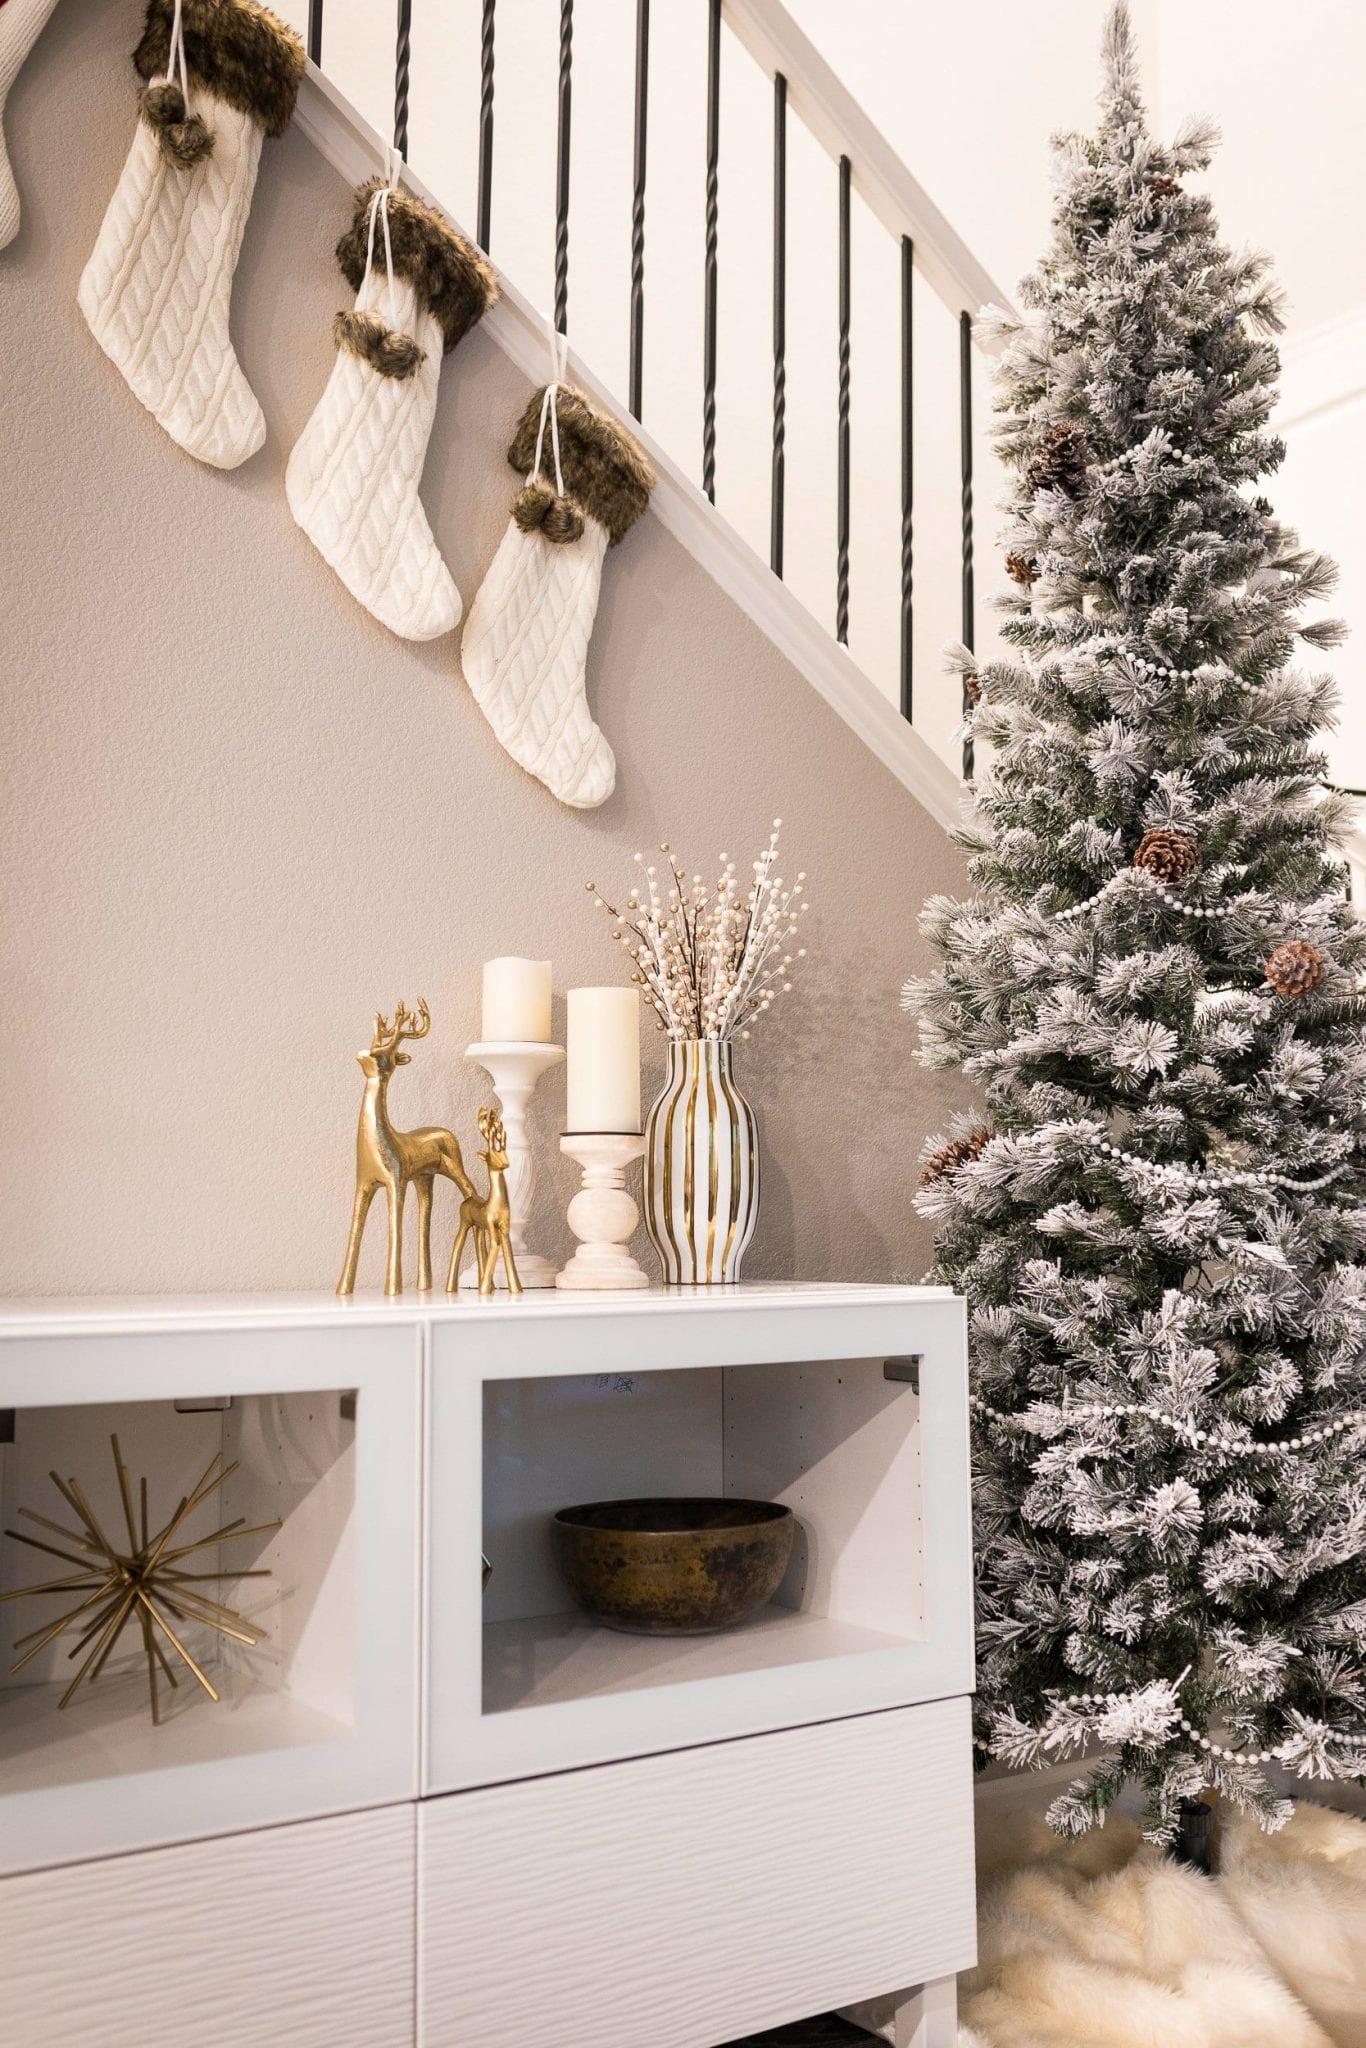 white christmas decor | holiday decor white and gold | christmas decor white winter wonderland | holiday decor christmas | white christmas decor elegant | never skip brunch by cara newhart #decor #christmas #holiday